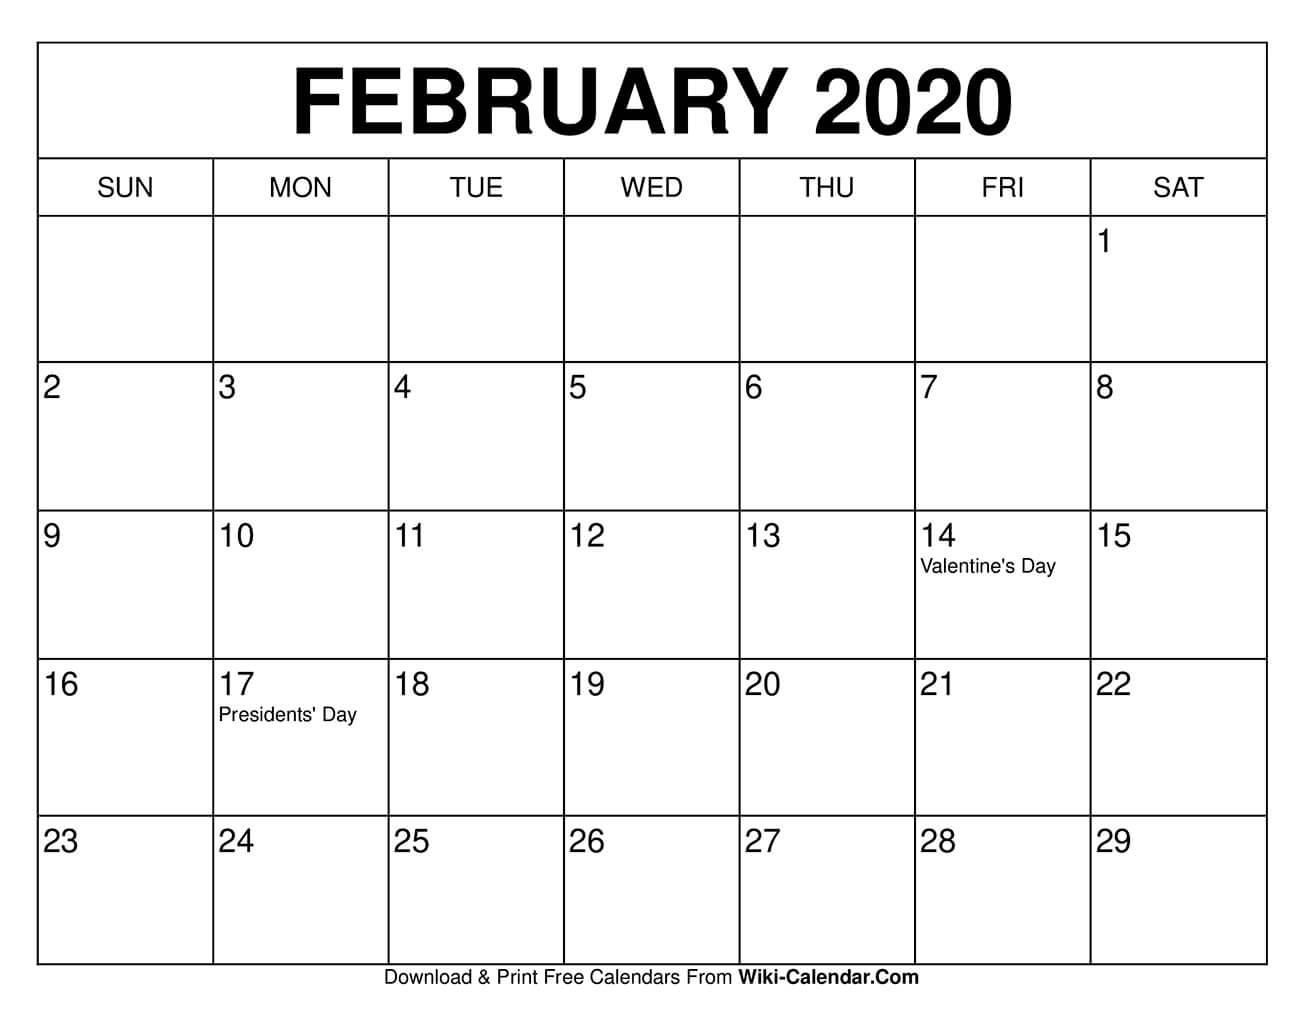 Free Printable February 2020 Calendars  Printable February 2020 Calendar